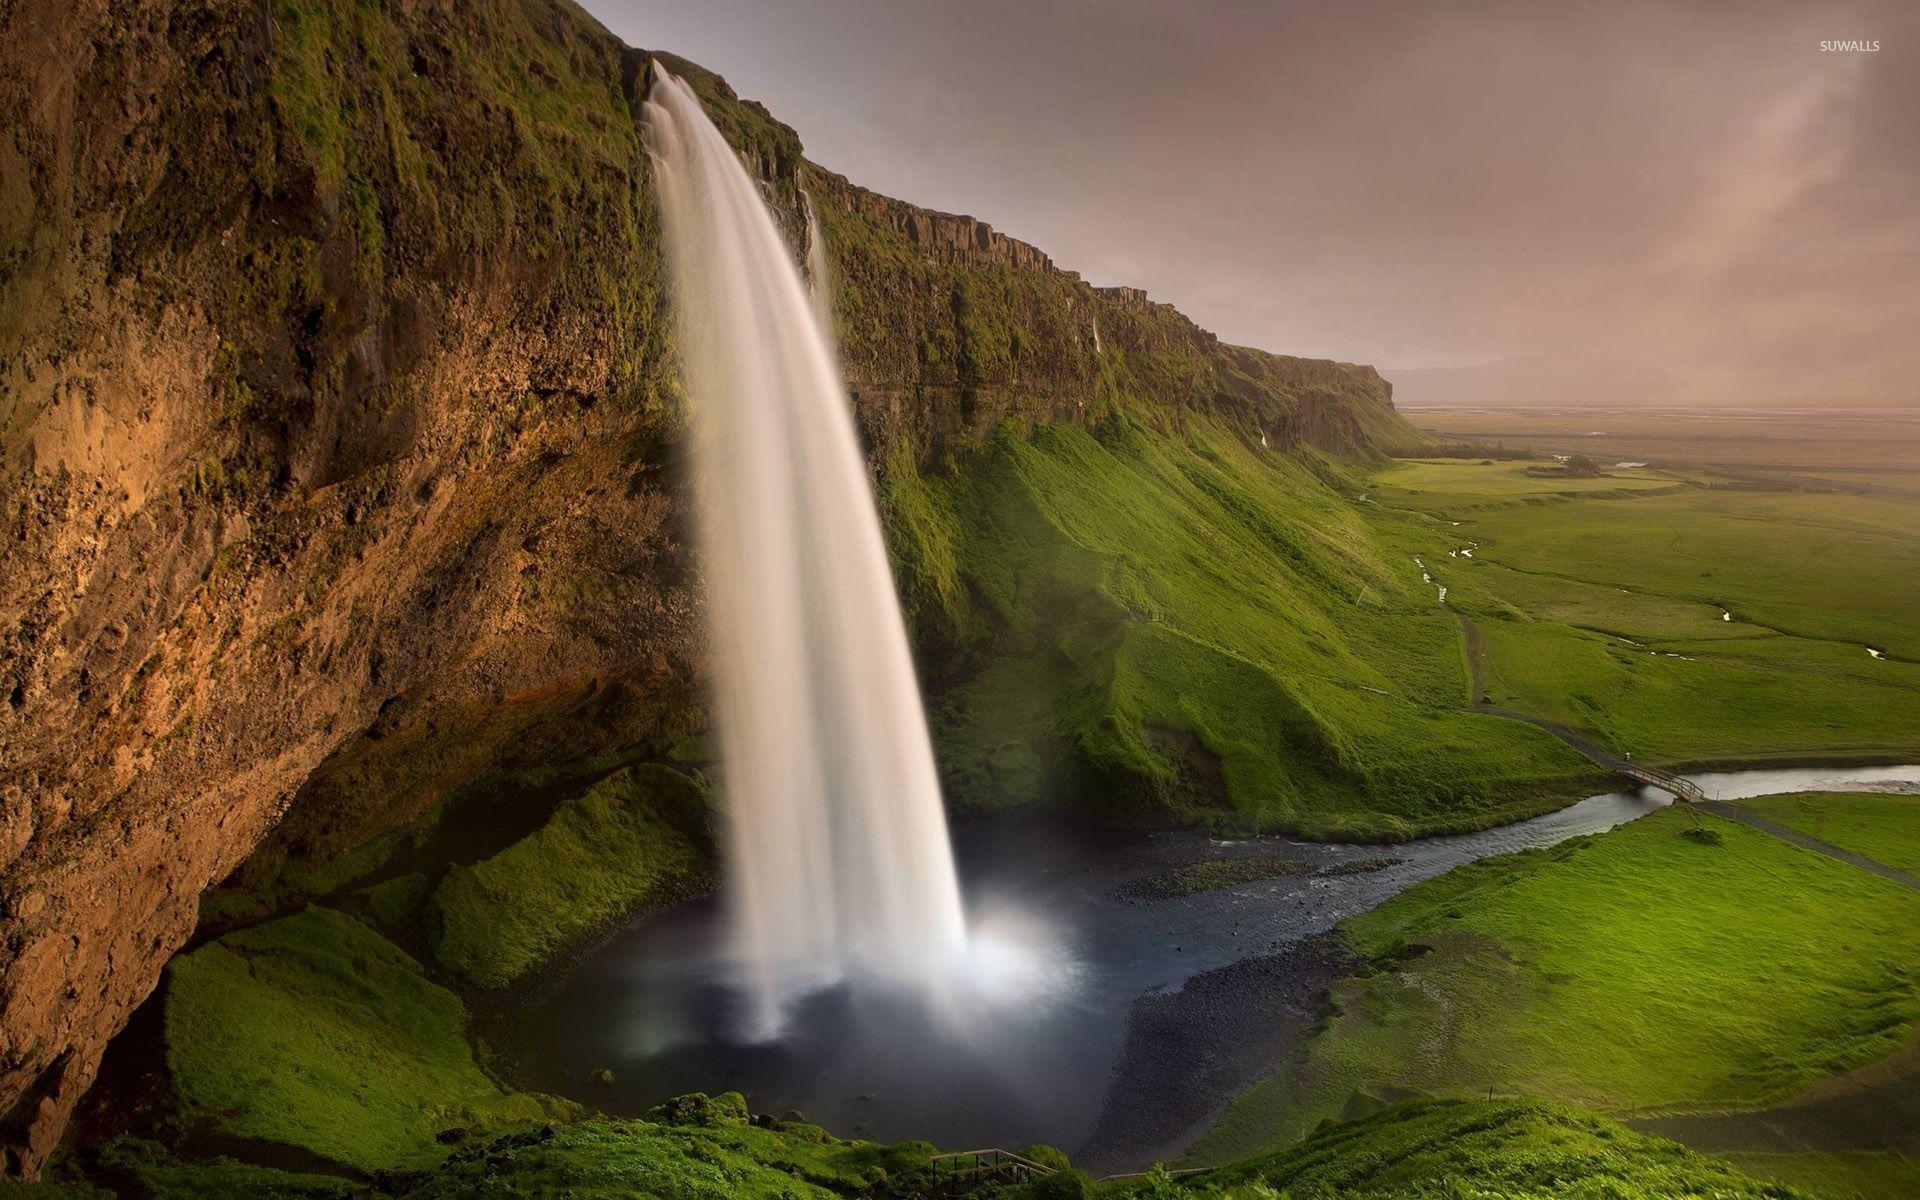 Seljalandsfoss Waterfall 1920x1200 Wallpaper Teahub Io